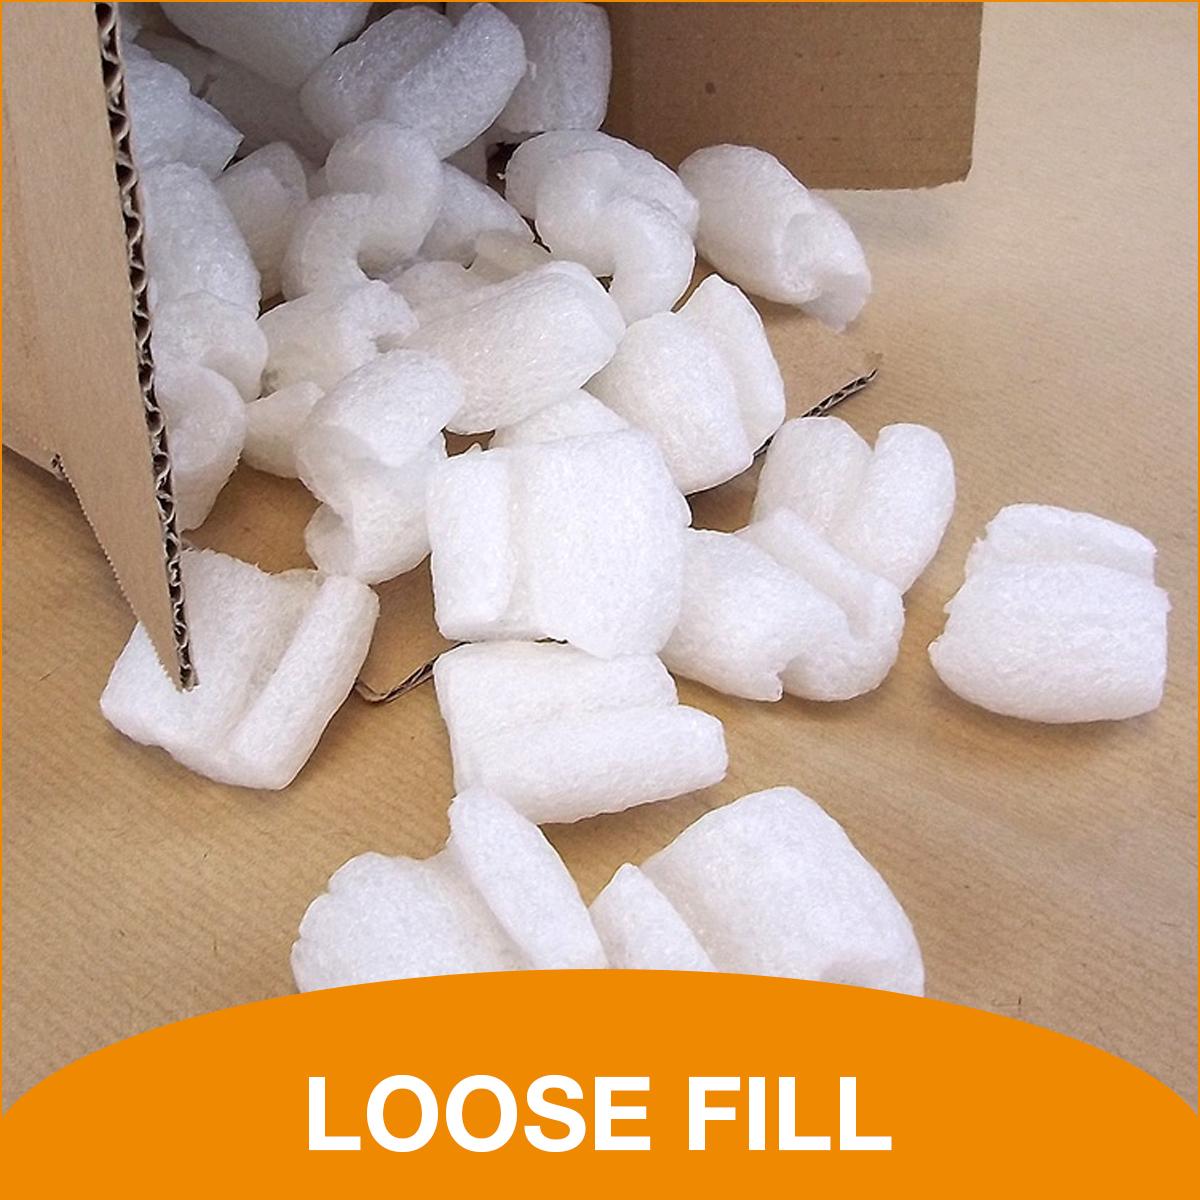 Loose Fill